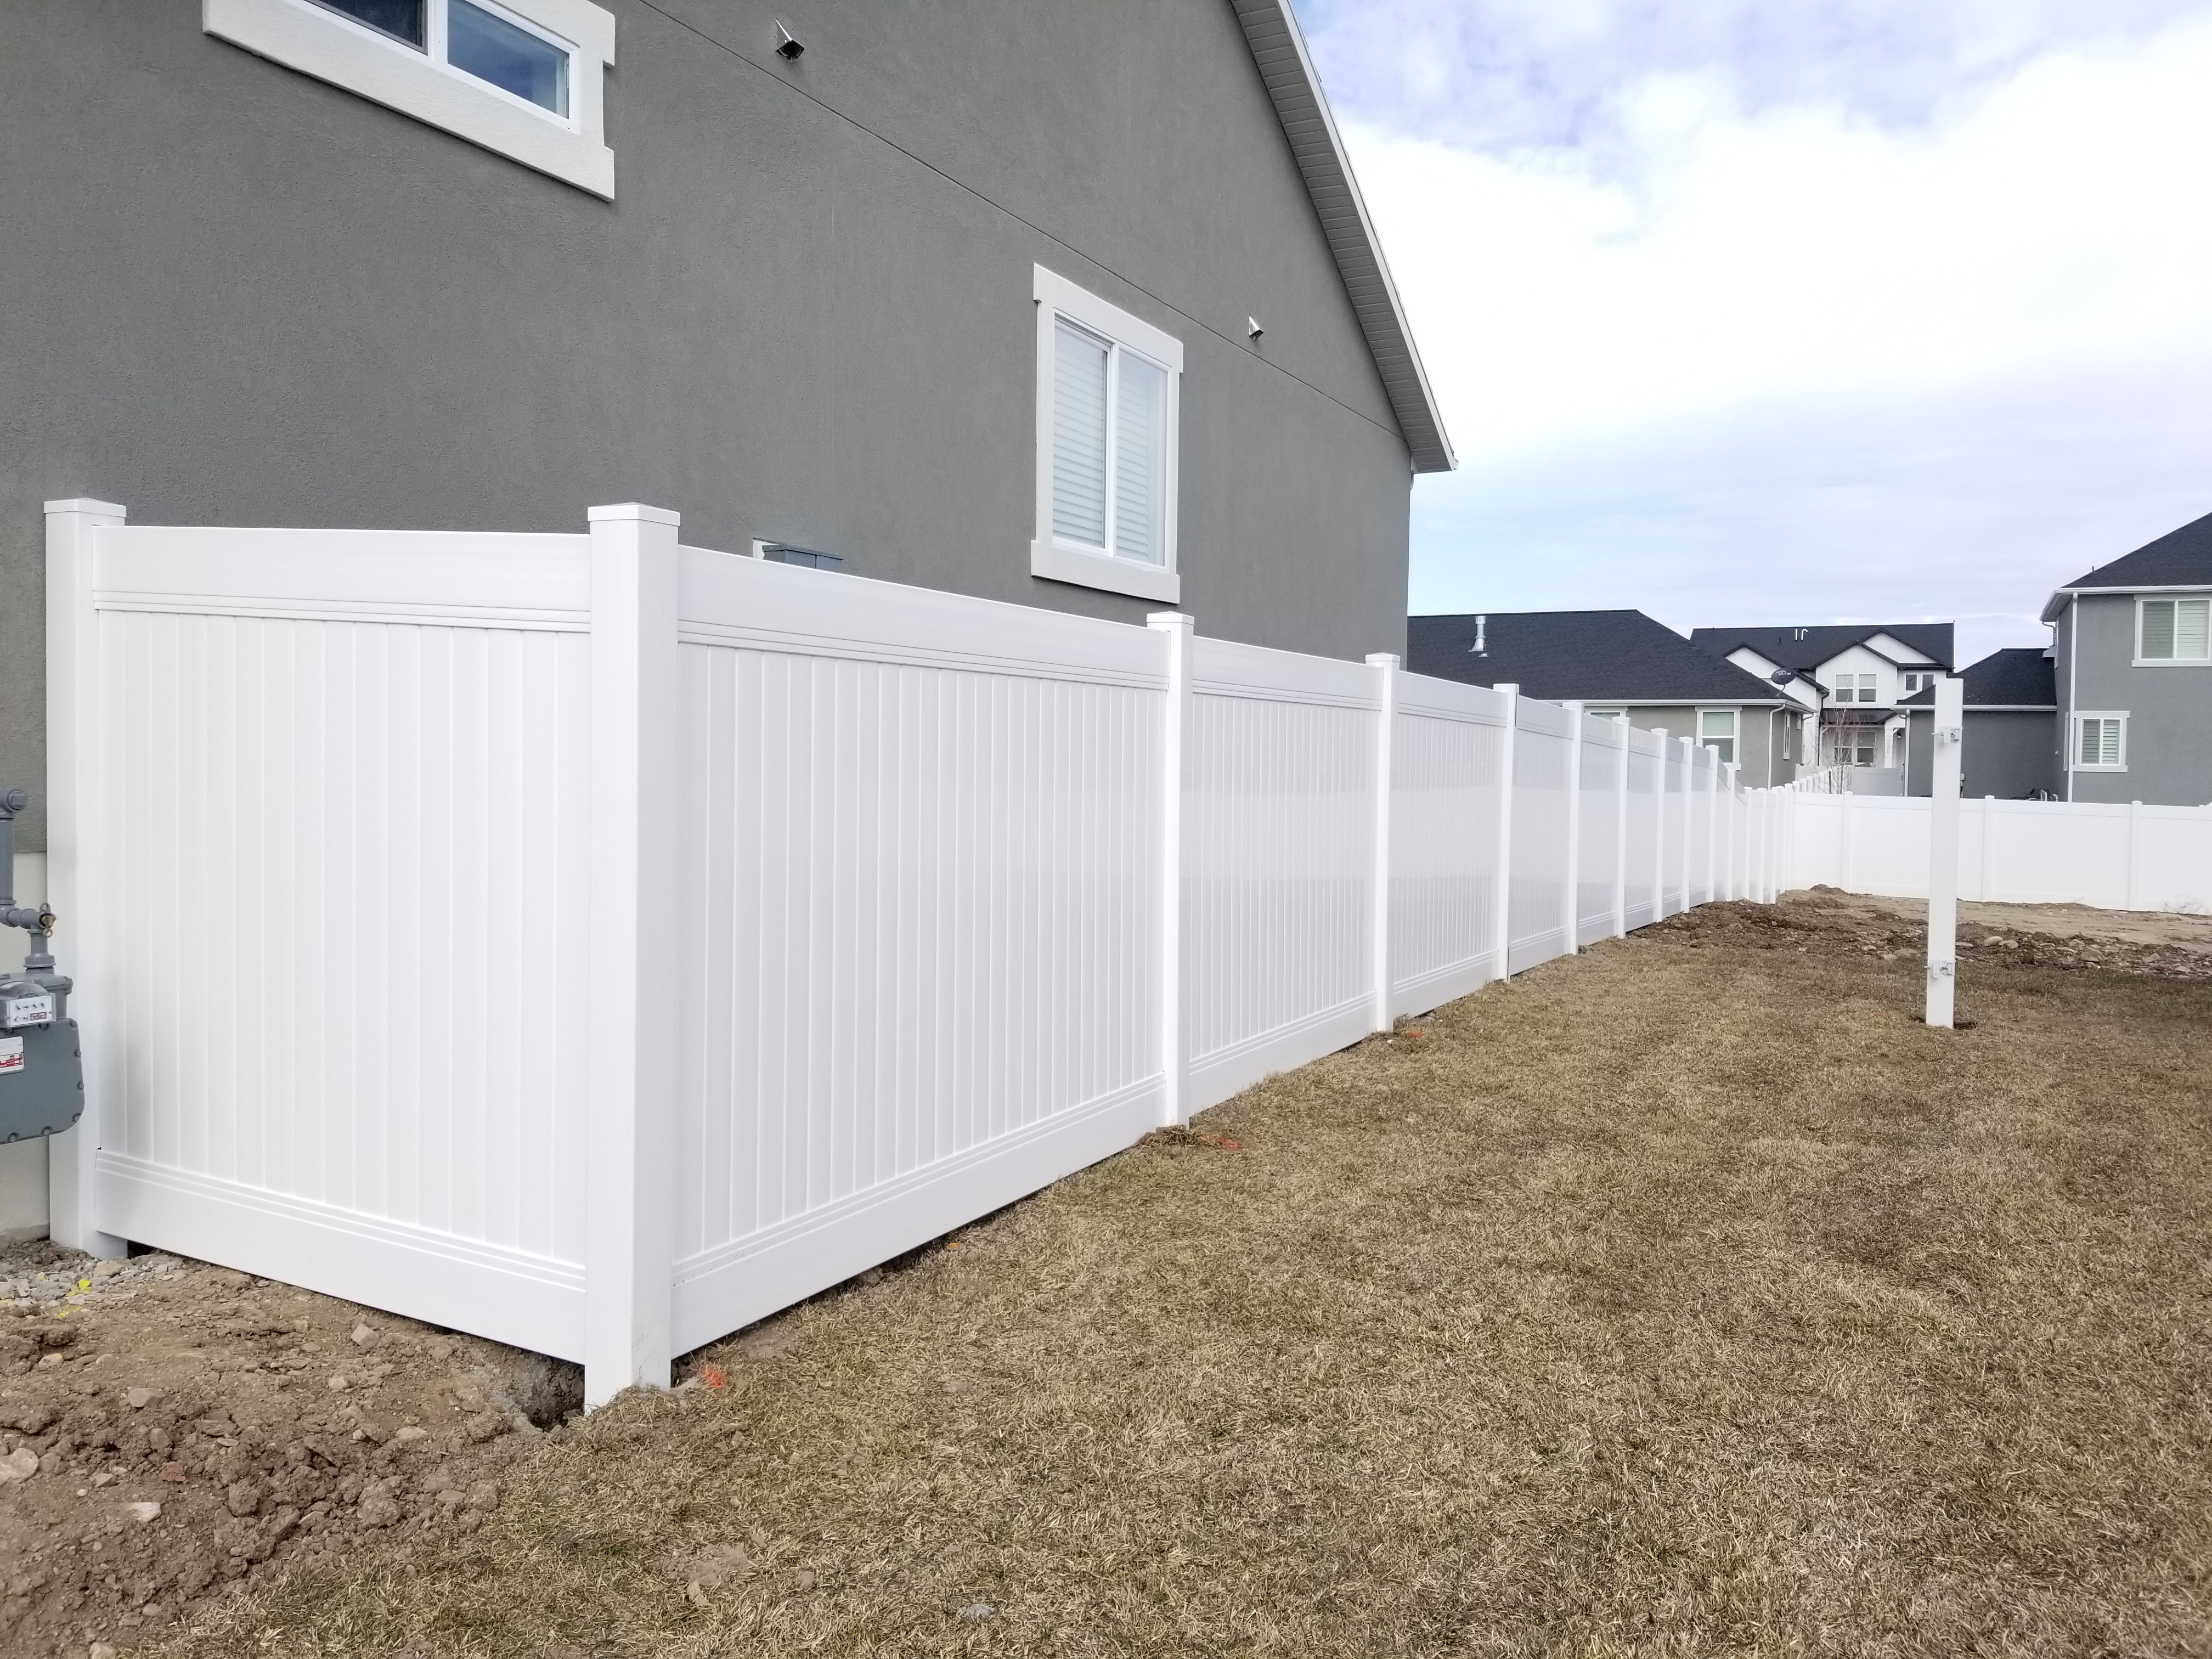 Integrity Fence USA image 4